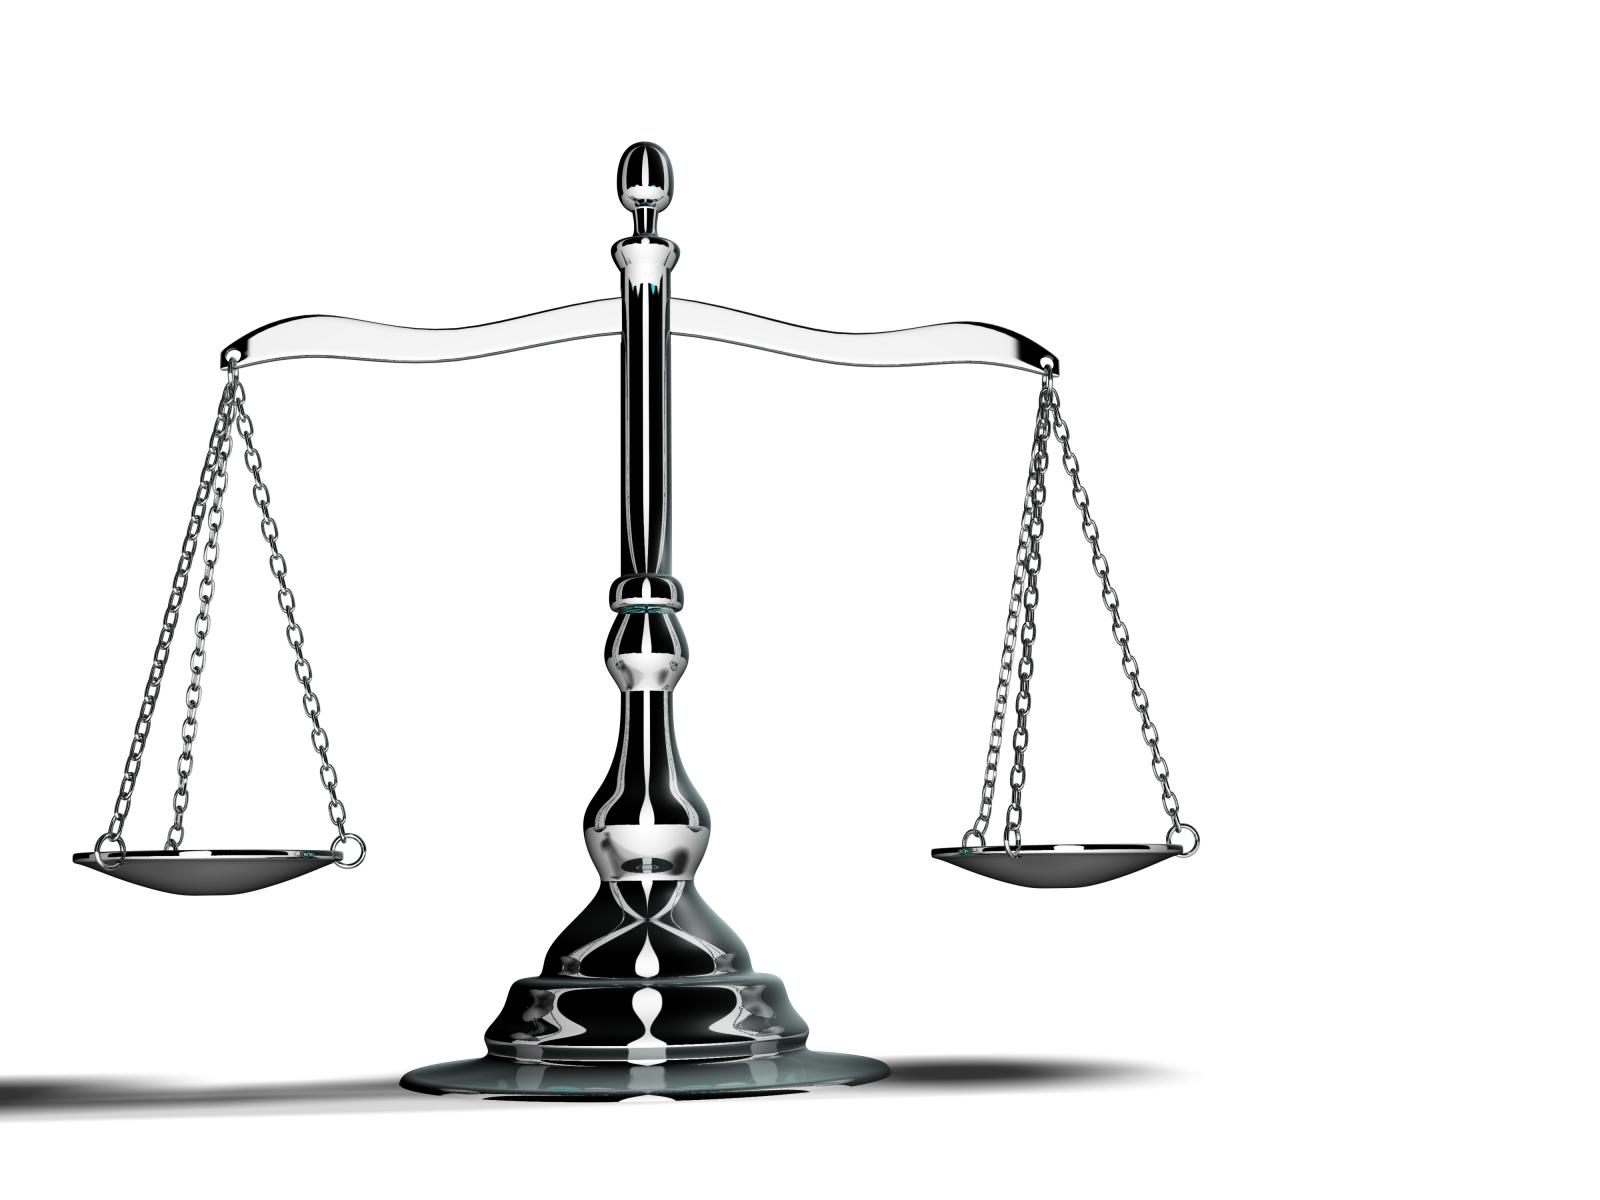 Bofa Underwater Mortgage Cases Hit Supreme Court